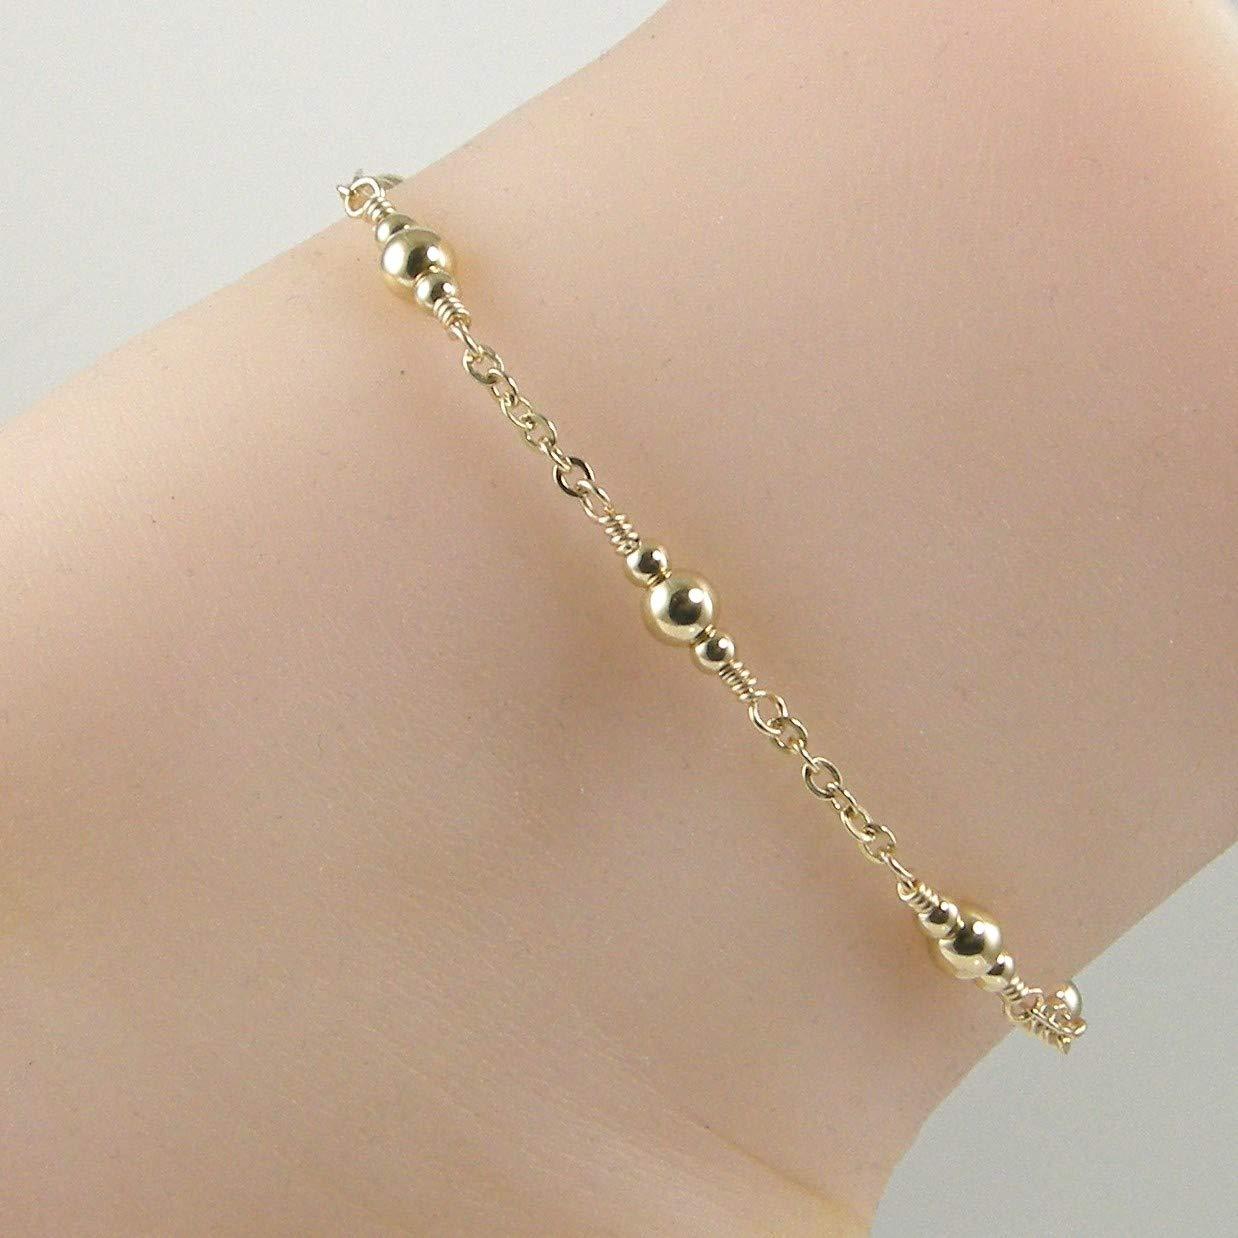 Gold Chain Gold Bead Ankle Bracelet Gold Anklet